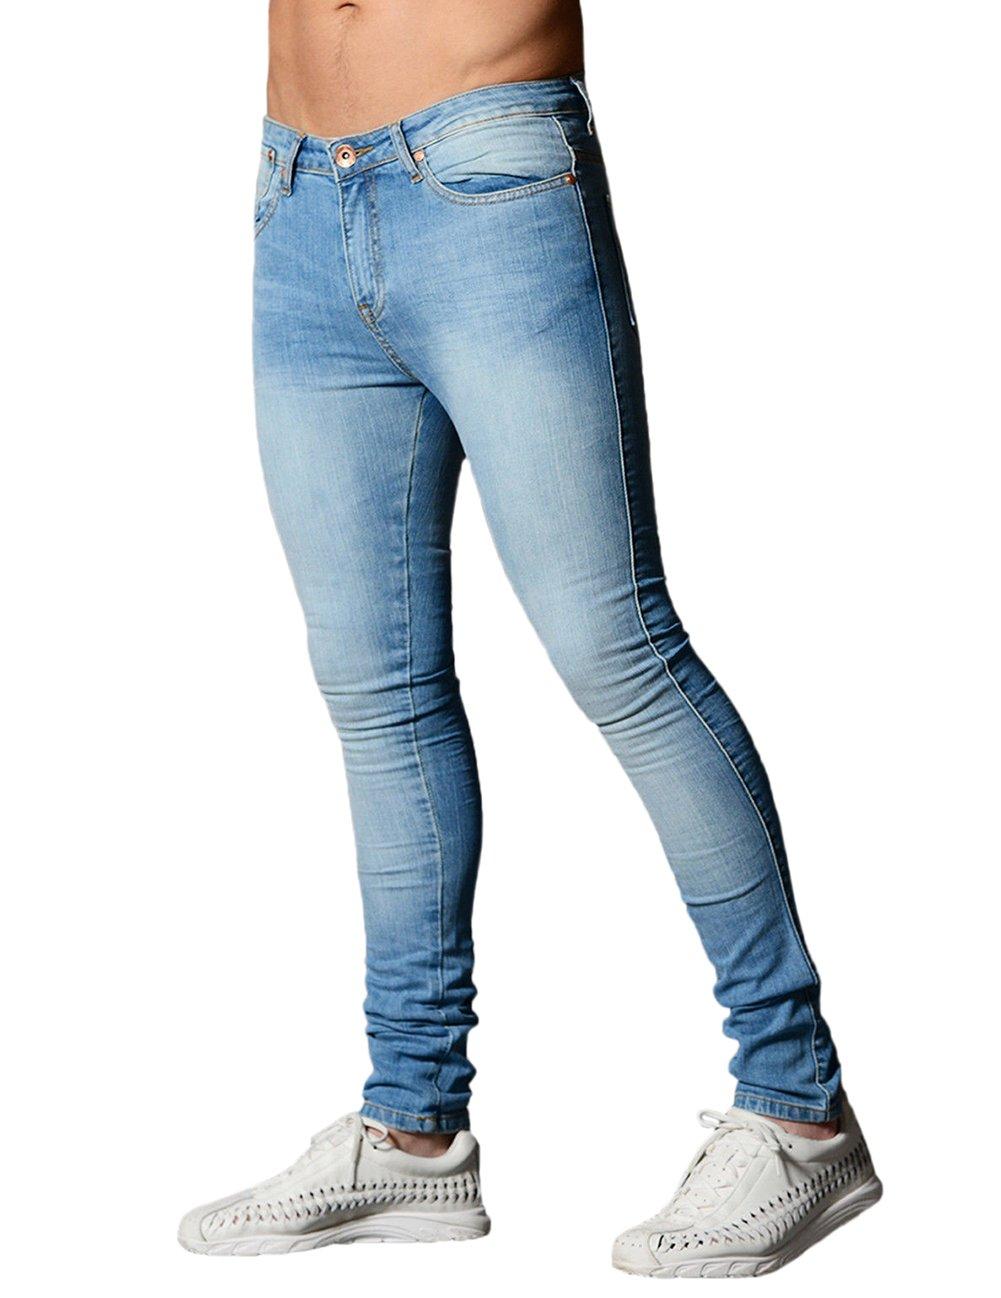 XARAZA Men's Skinny Slim Fit Stretch Jeans Denim Pencil Pants (Light Blue, US 30) by XARAZA (Image #1)